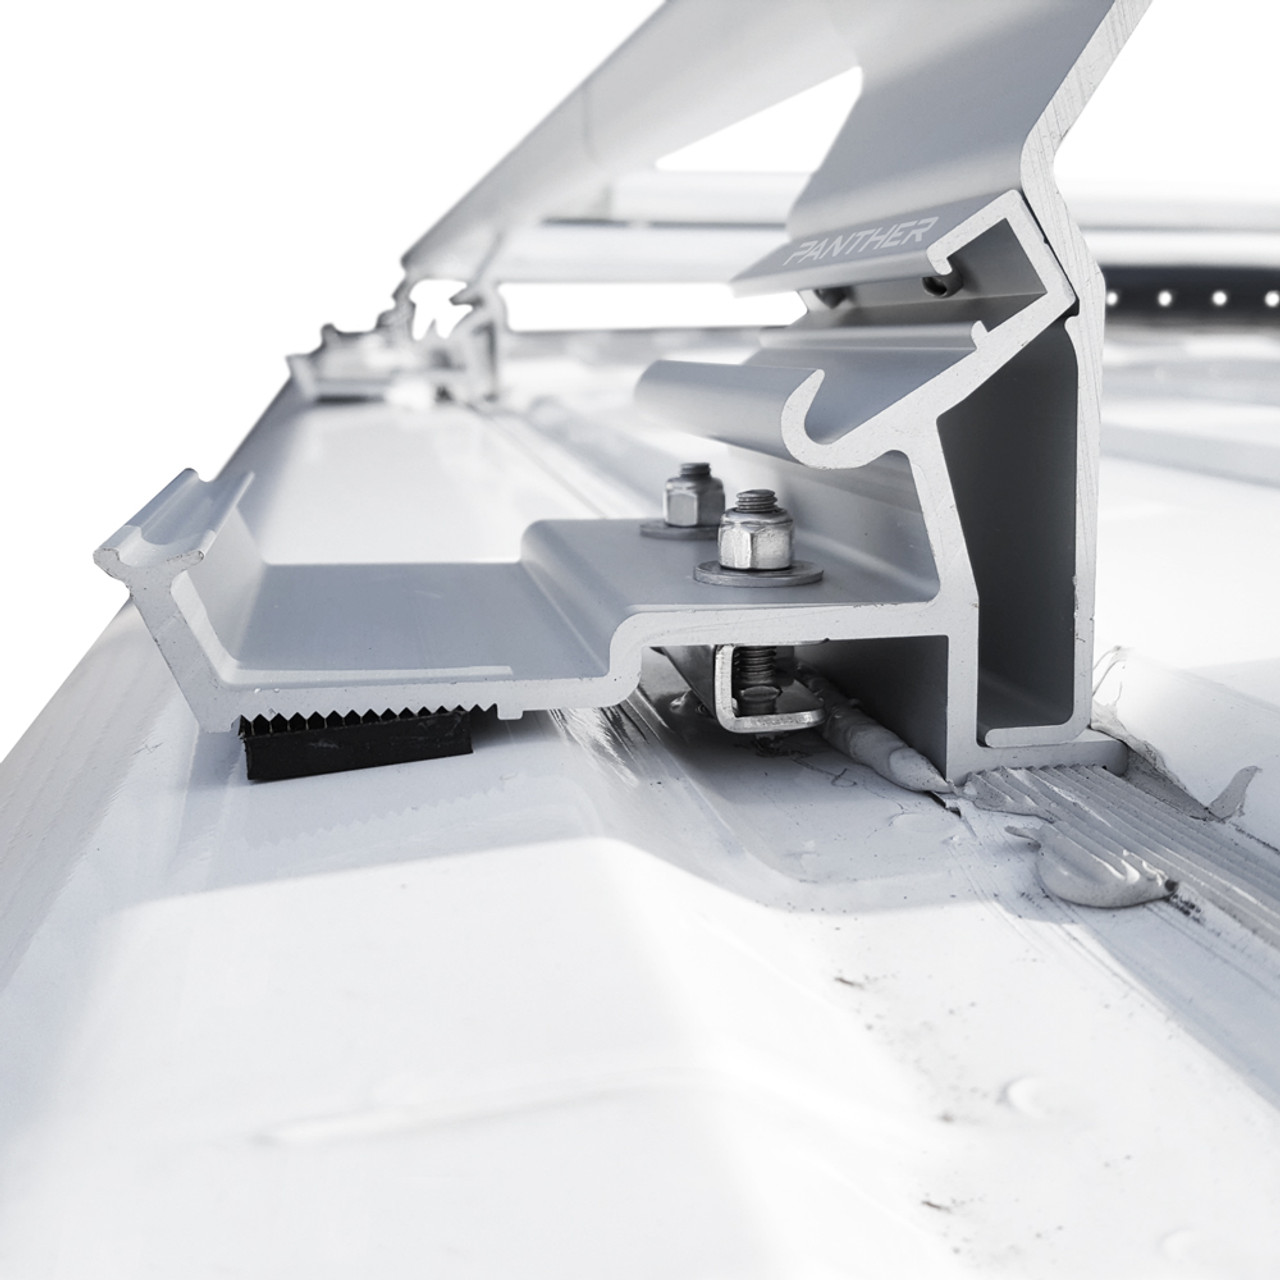 Fiamma 05808 02 Dodge Promaster Xl Long Wheel Base Roof Rack